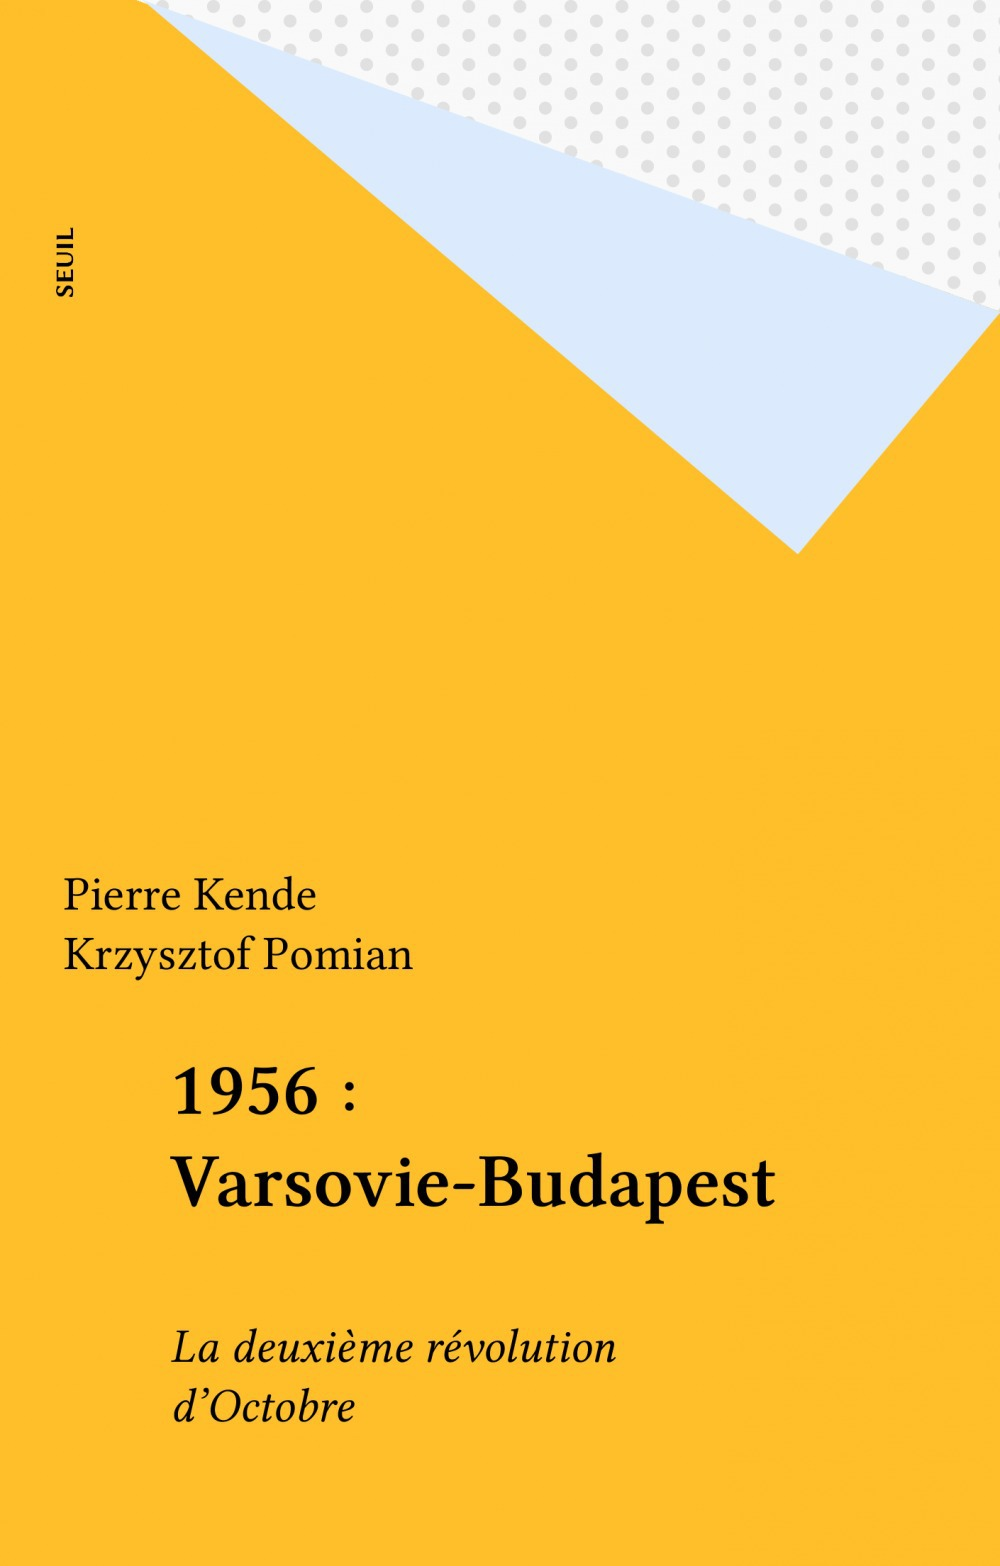 1956 : Varsovie-Budapest  - Pierre Kende  - Collectif  - Krzysztof Pomian